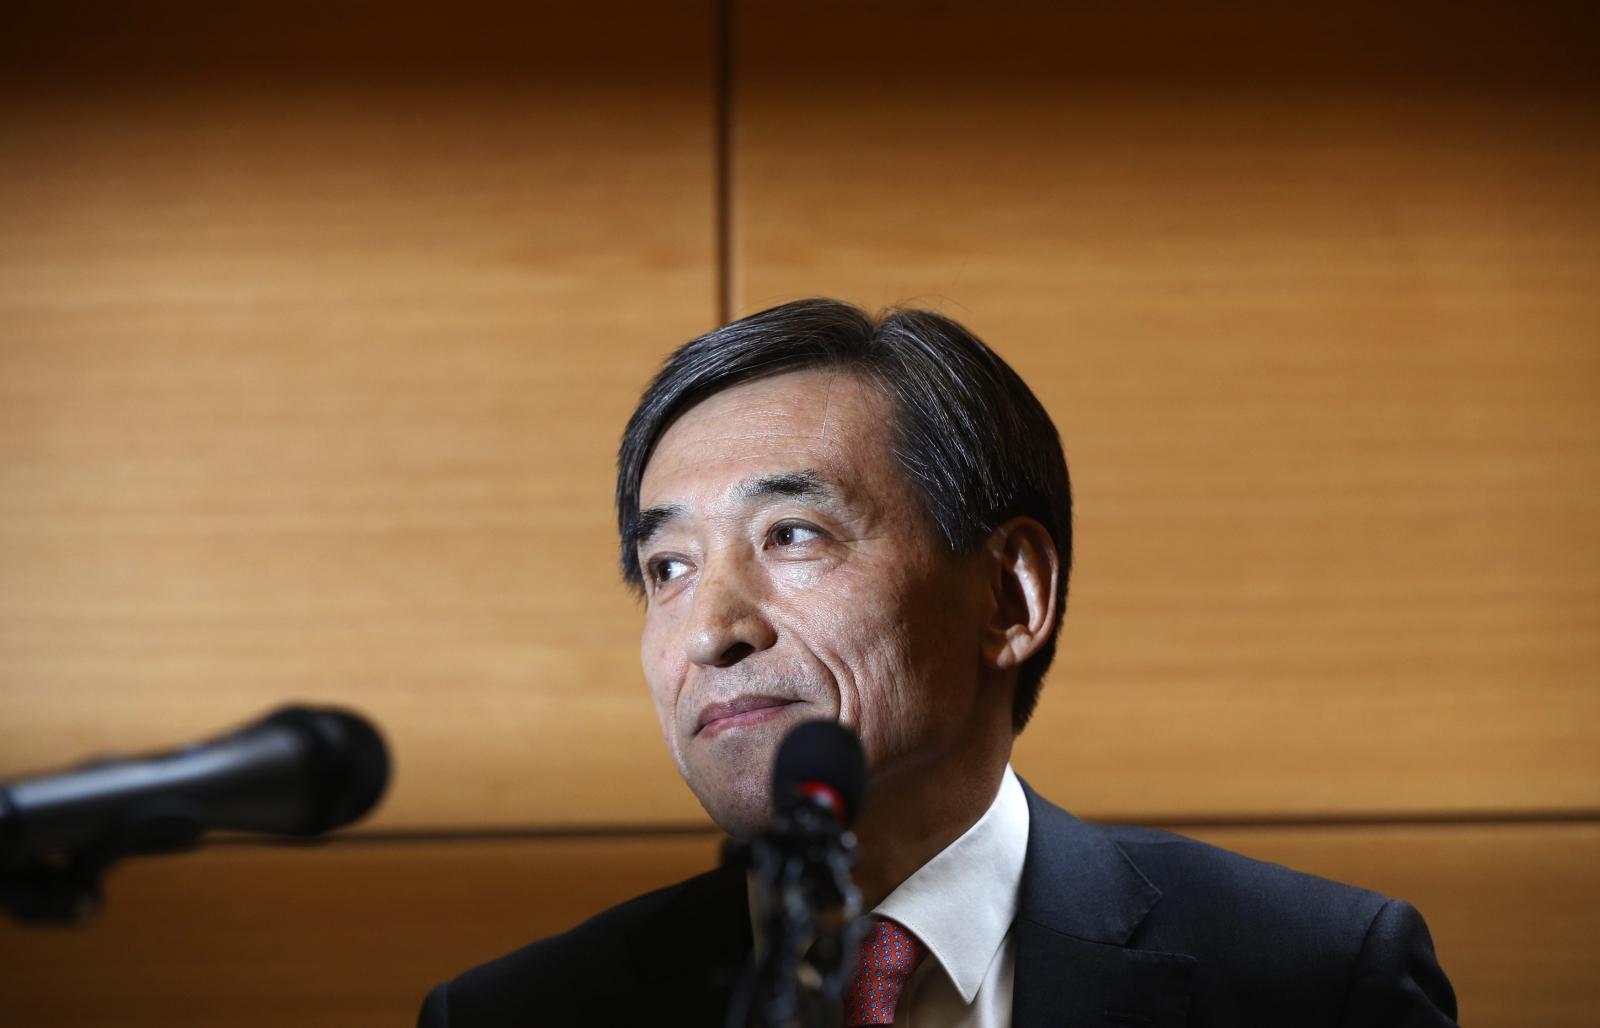 Lee Ju-yeol, Bank of Korea governor